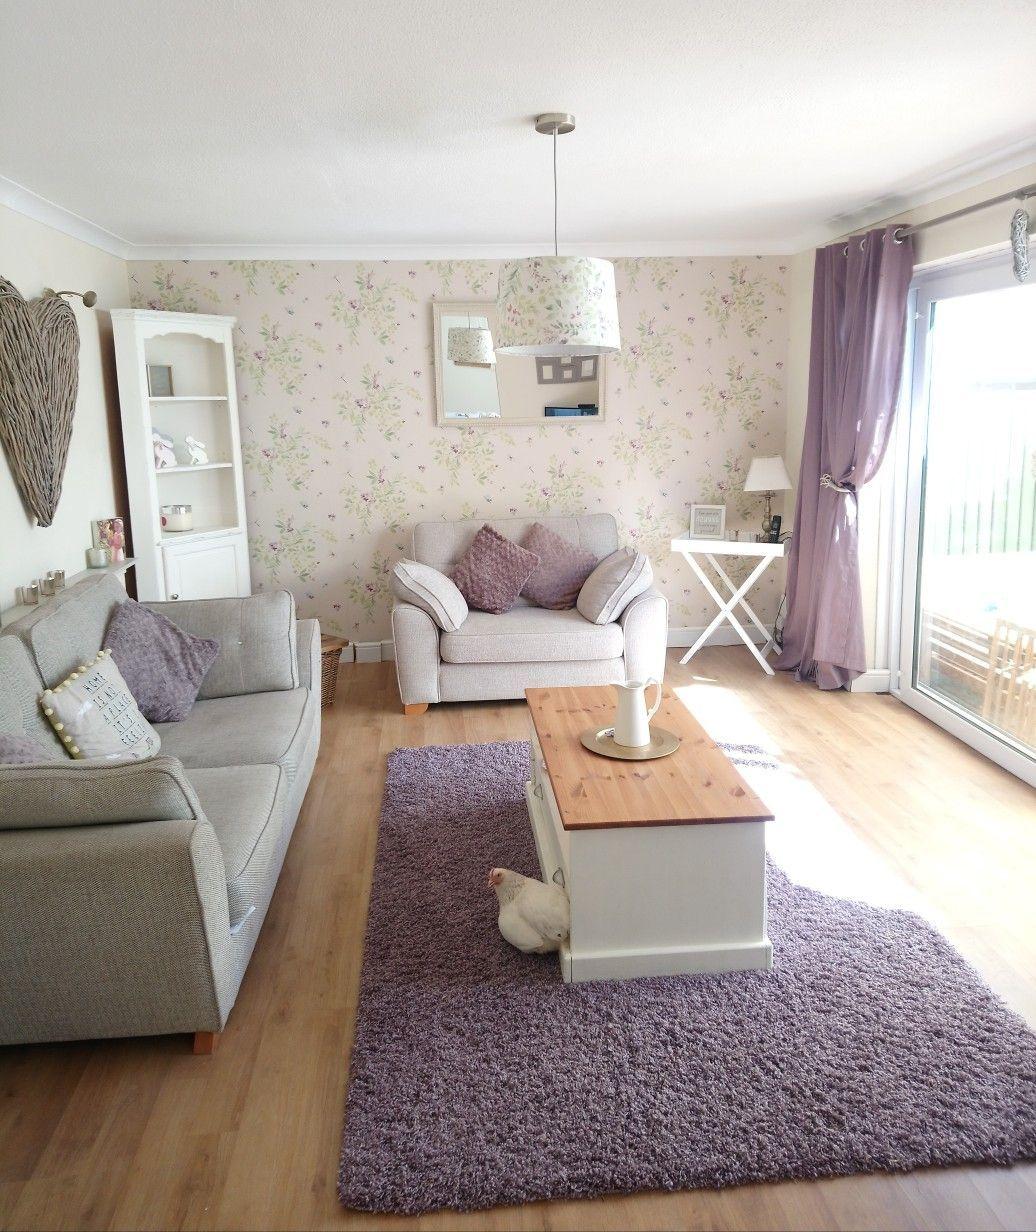 Dunelm secret garden wallpaper, dunelm living room, garden room